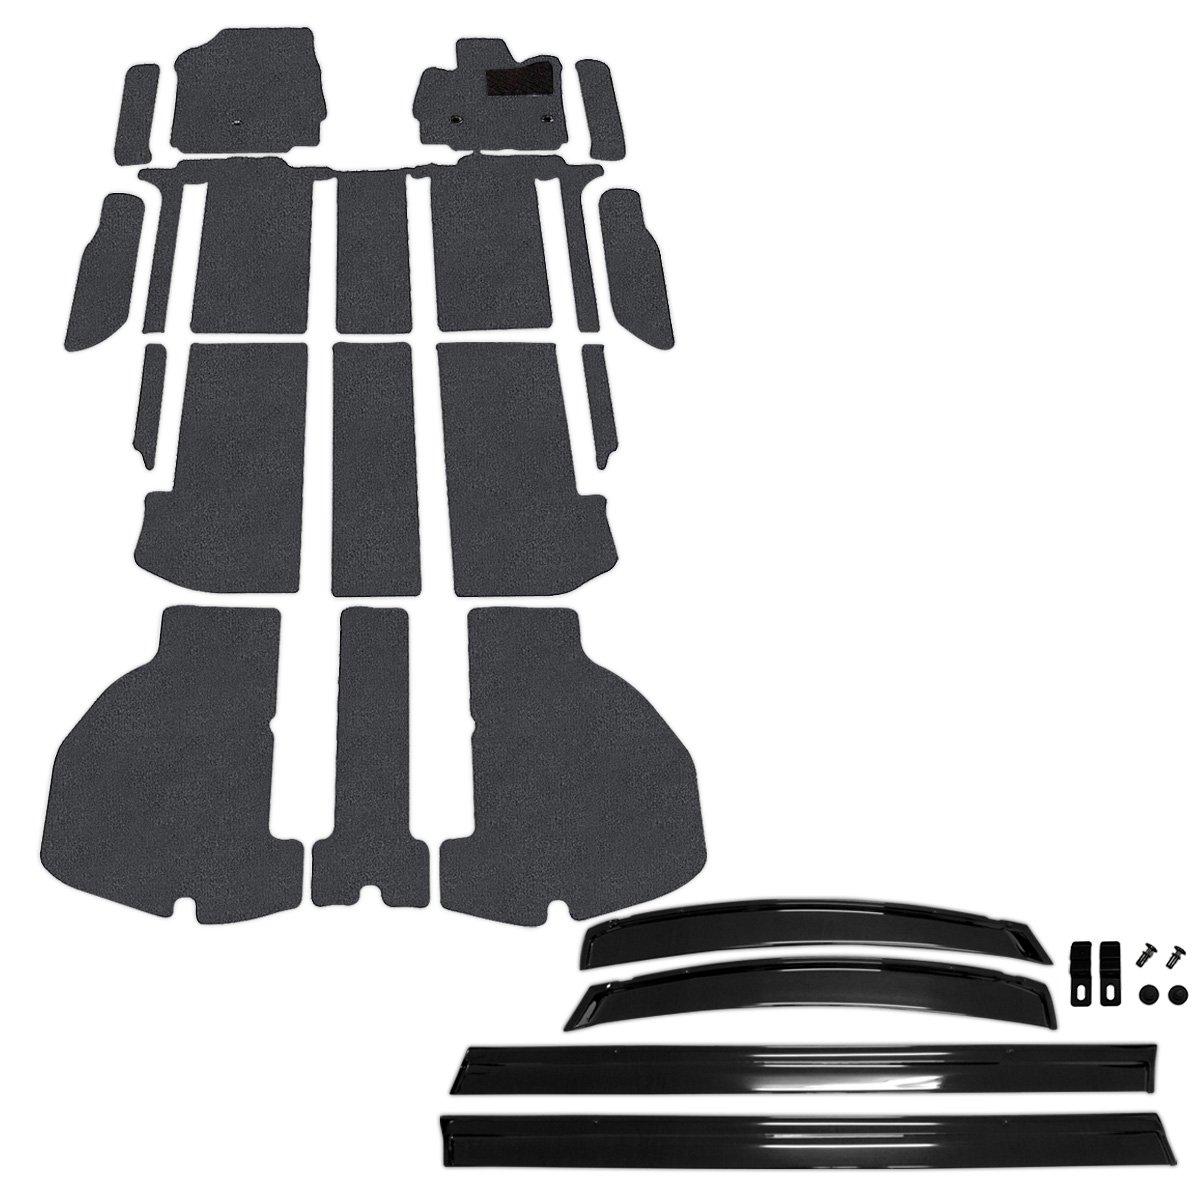 D.Iプランニング カー用品 フロアマット & ステップマット & サイドバイザー セット 型番3 【 トヨタ アルファード 30系 】 車用 カーマット DXグレー B00YM1MZDS 型番3|DXグレー DXグレー 型番3